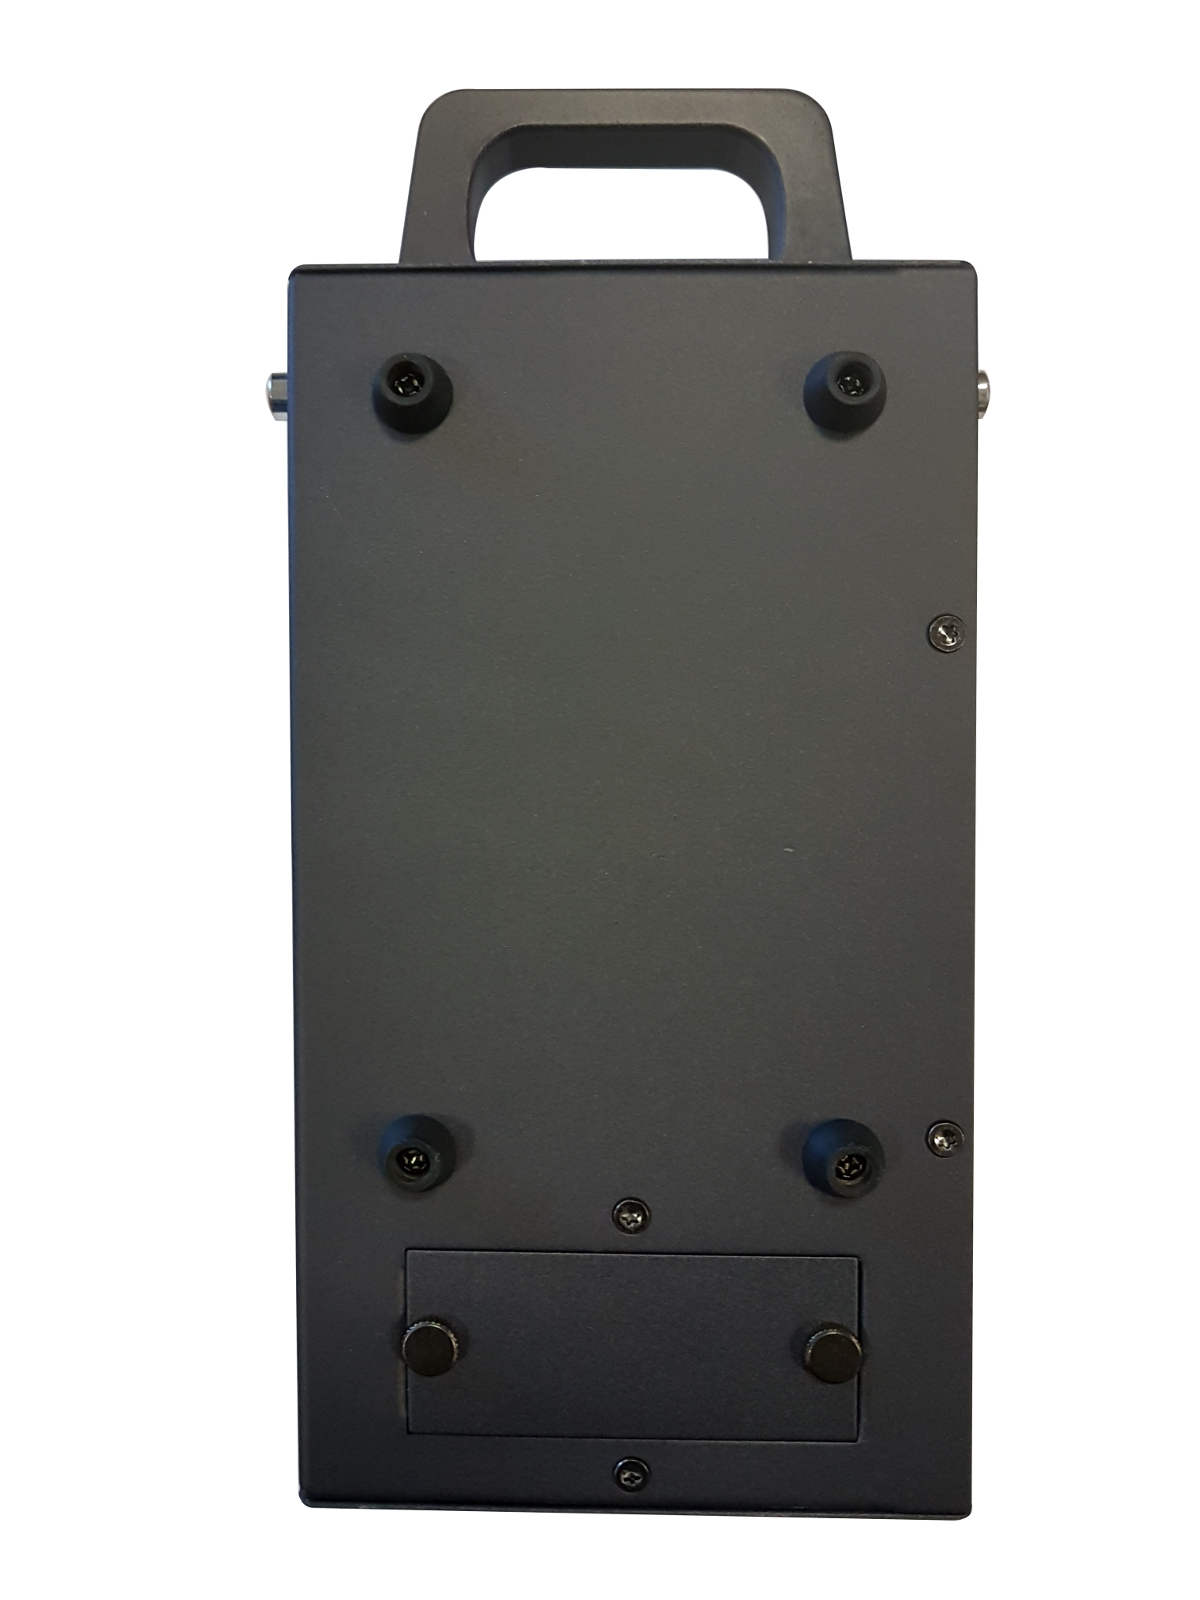 EXTREME CT1000 CABLE TESTER TESTACAVI CONNETTORI XLR JACK RCA USB SPEAKON MIDI DIN RJ45 TESTA CAVI AUDIO LAN ETHERNET S-VIDEO 3